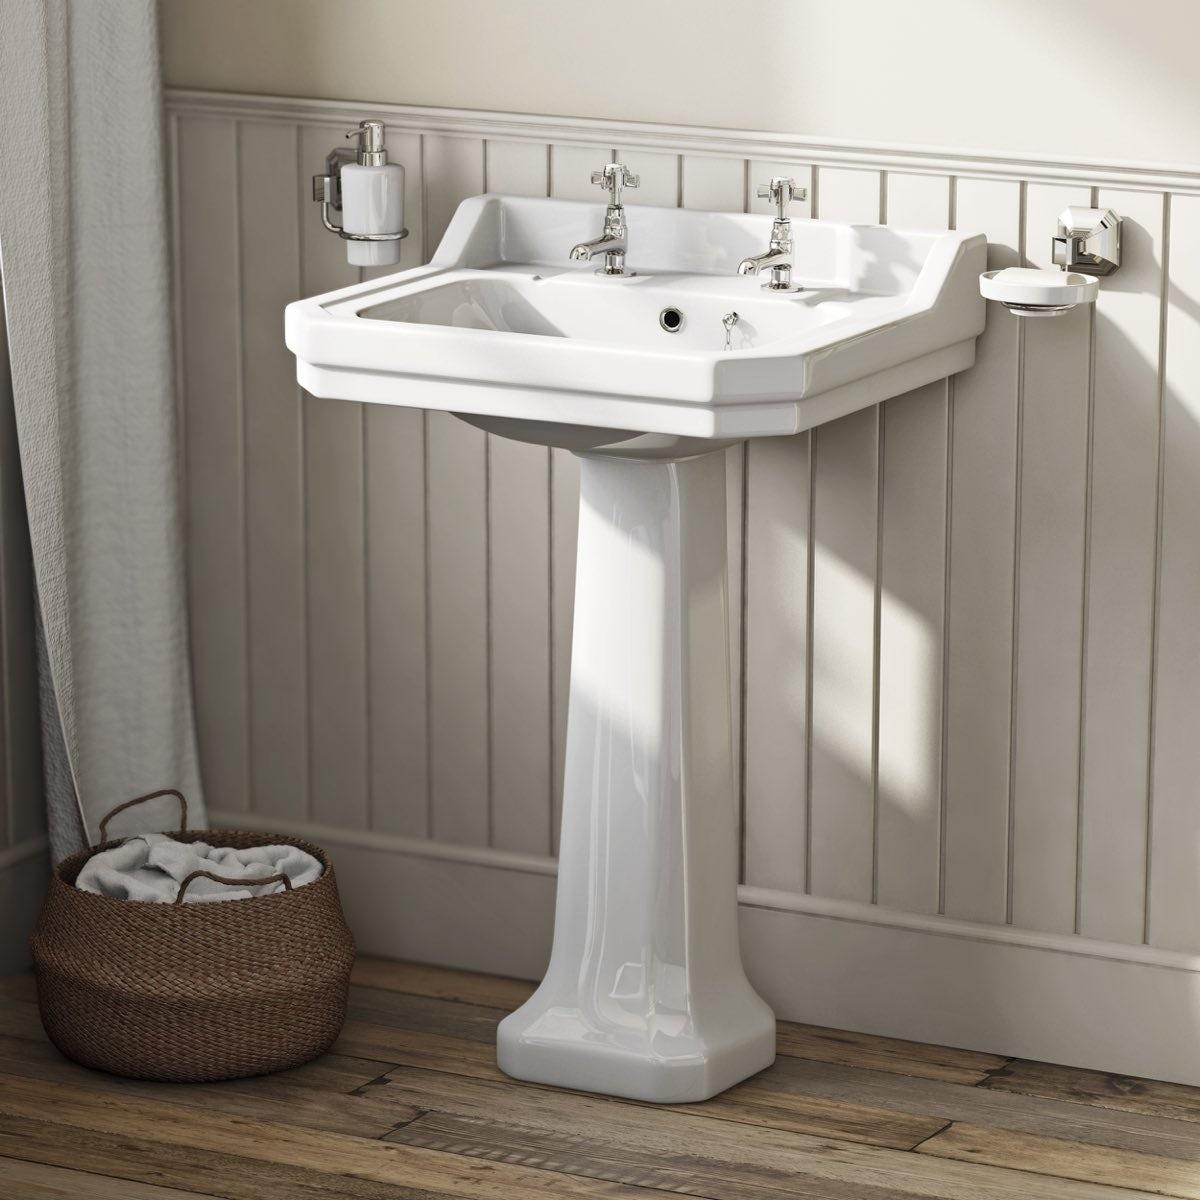 The Bath Co. Camberley 2 tap hole full pedestal basin 560mm